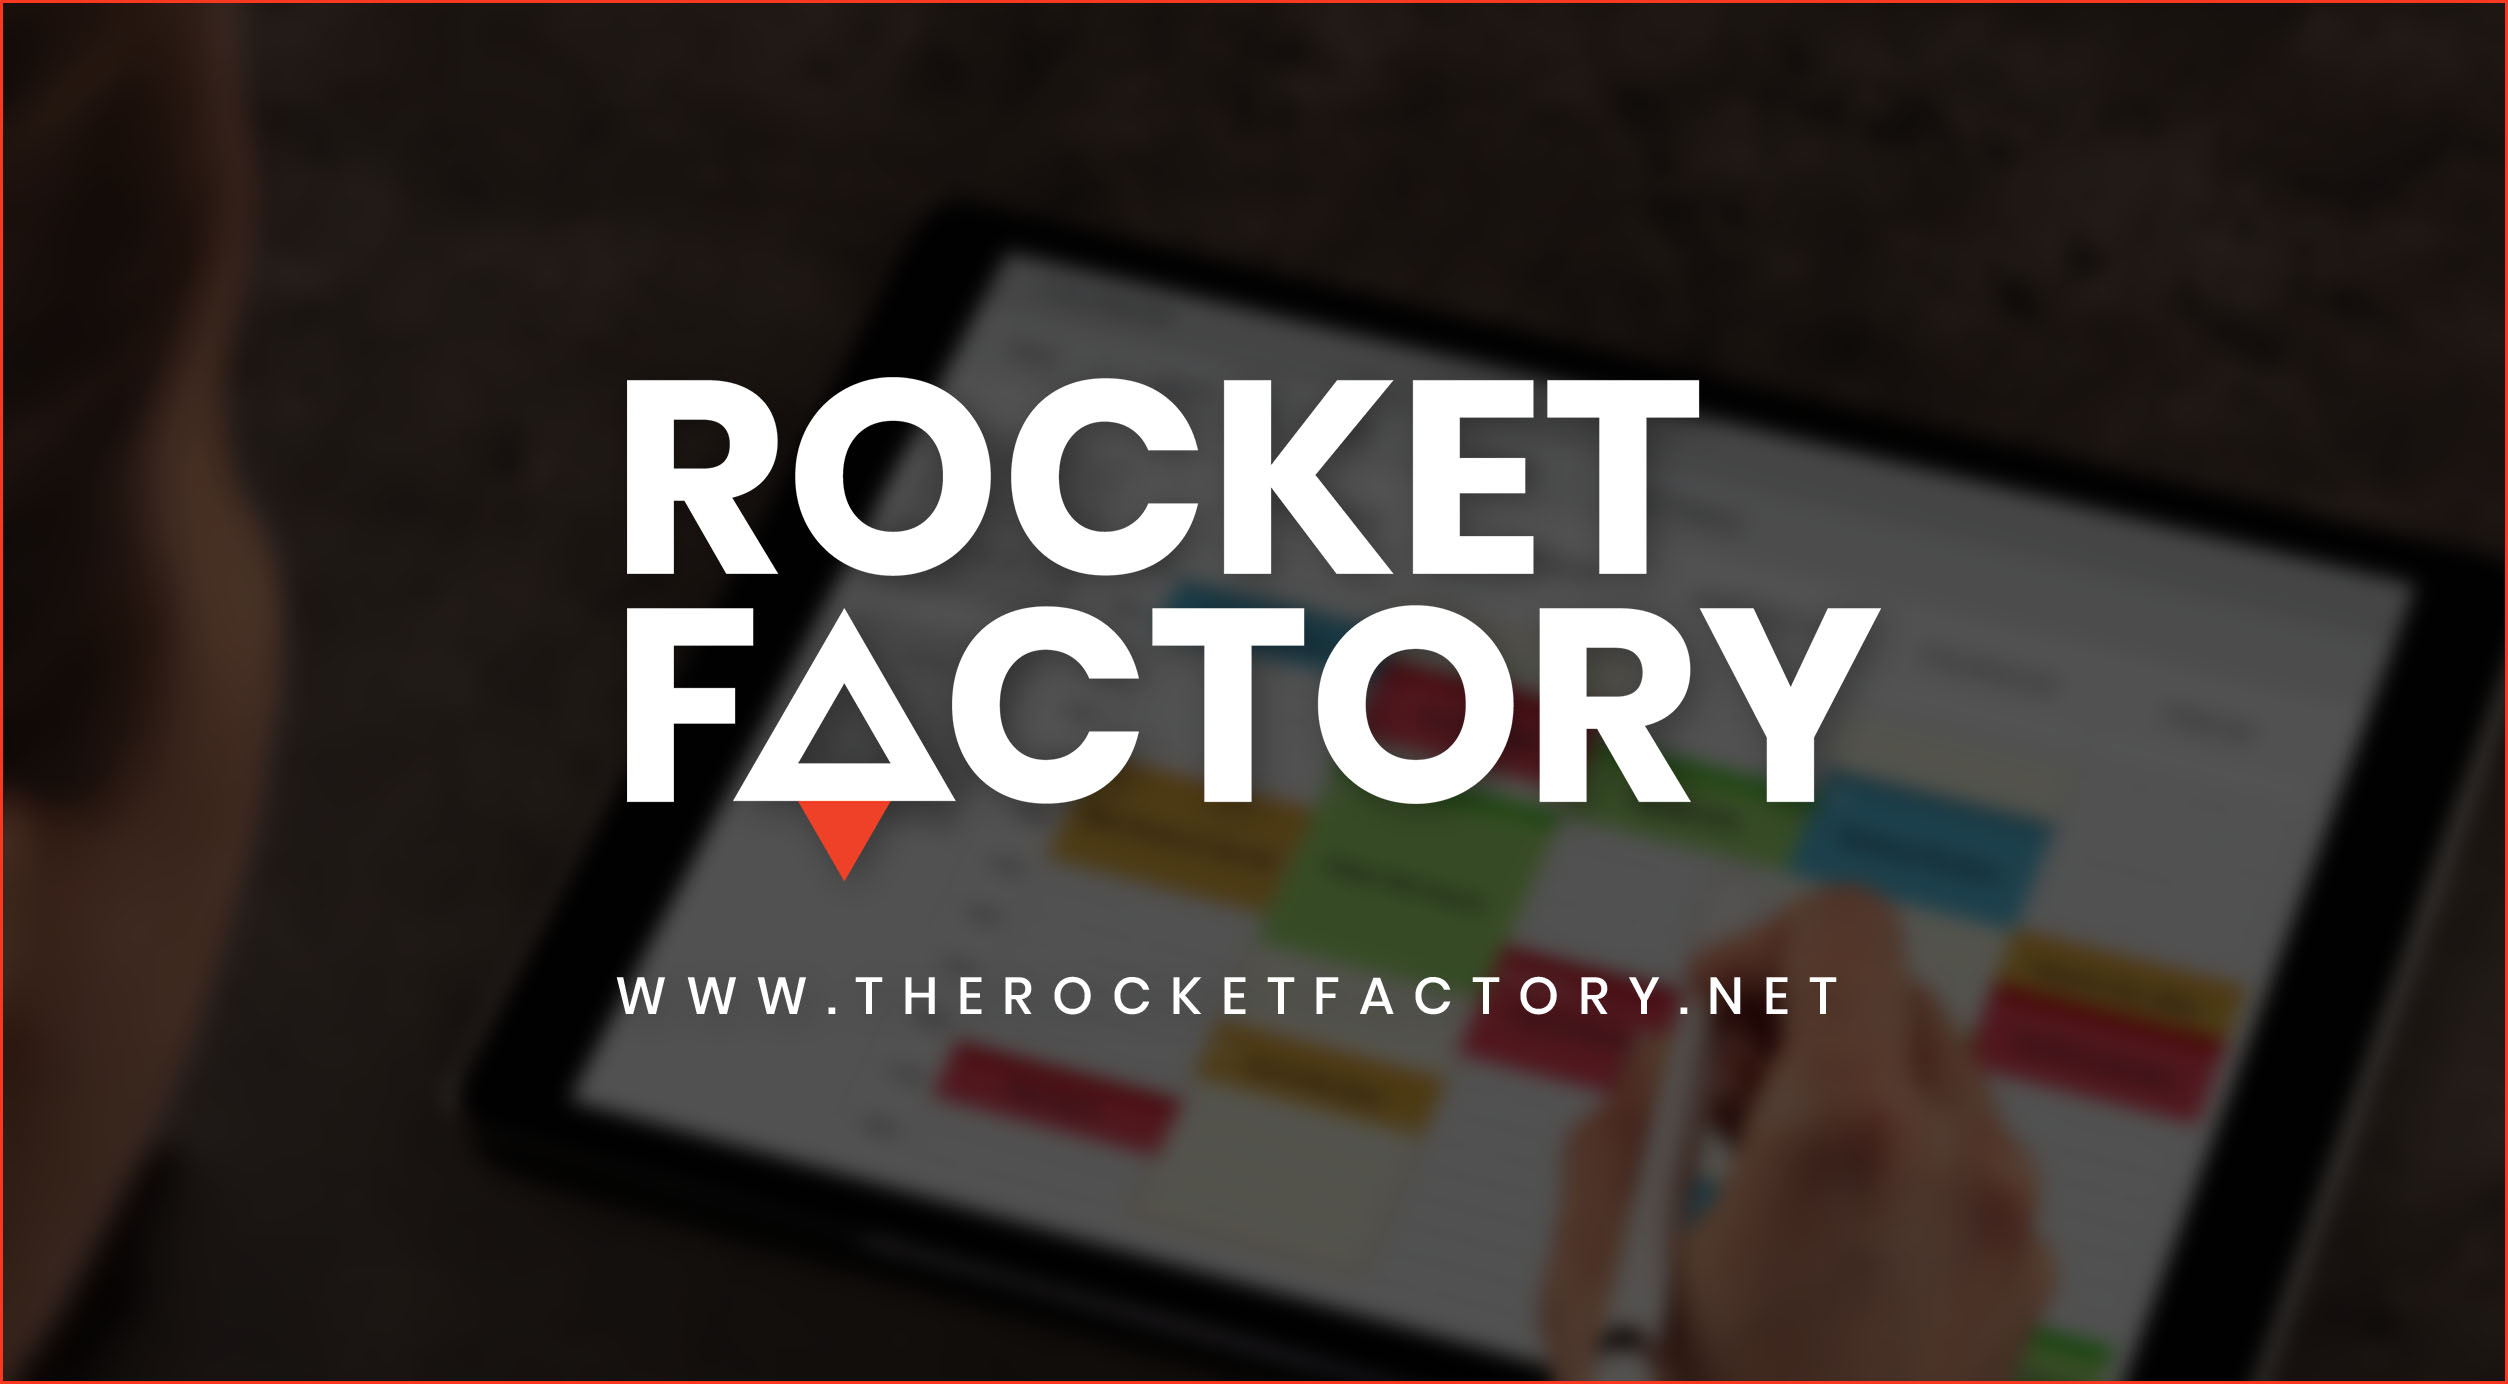 Schedule The Rocket Factory